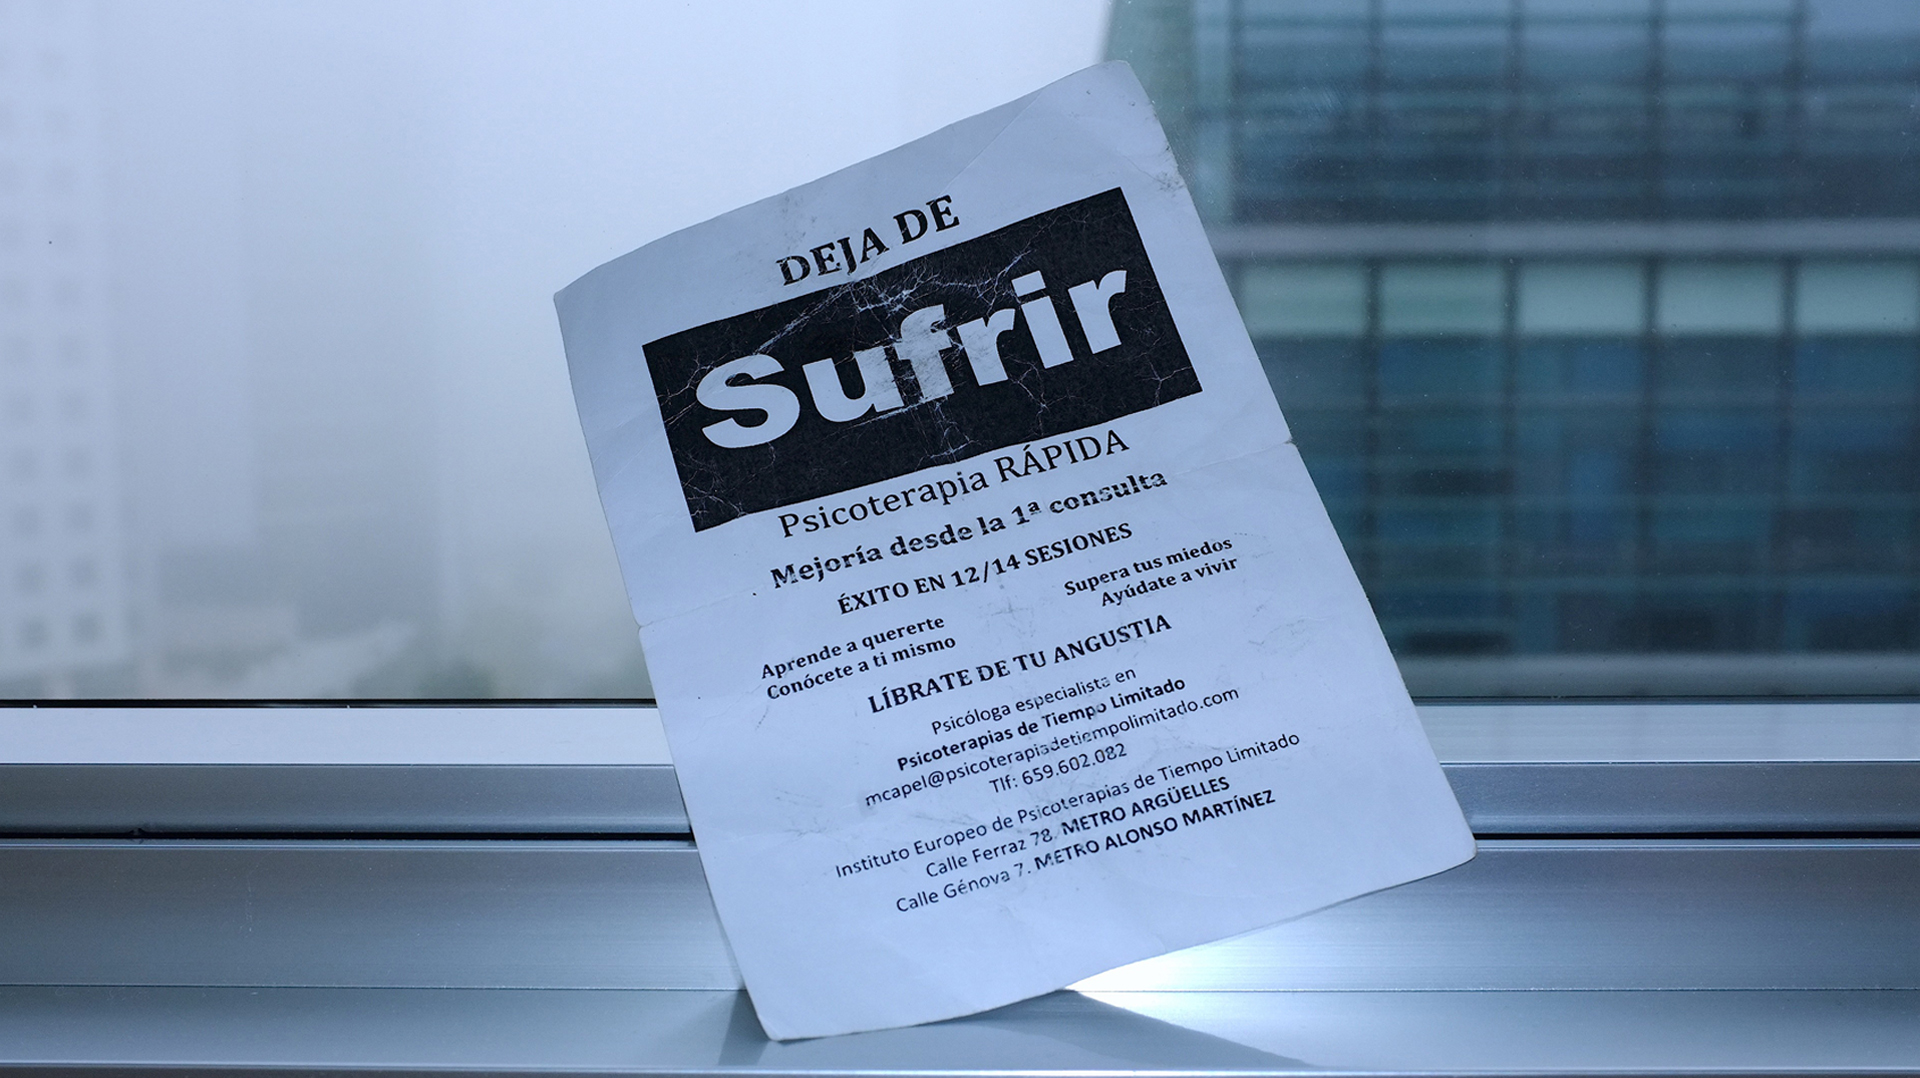 DdS Lisboa<br/>